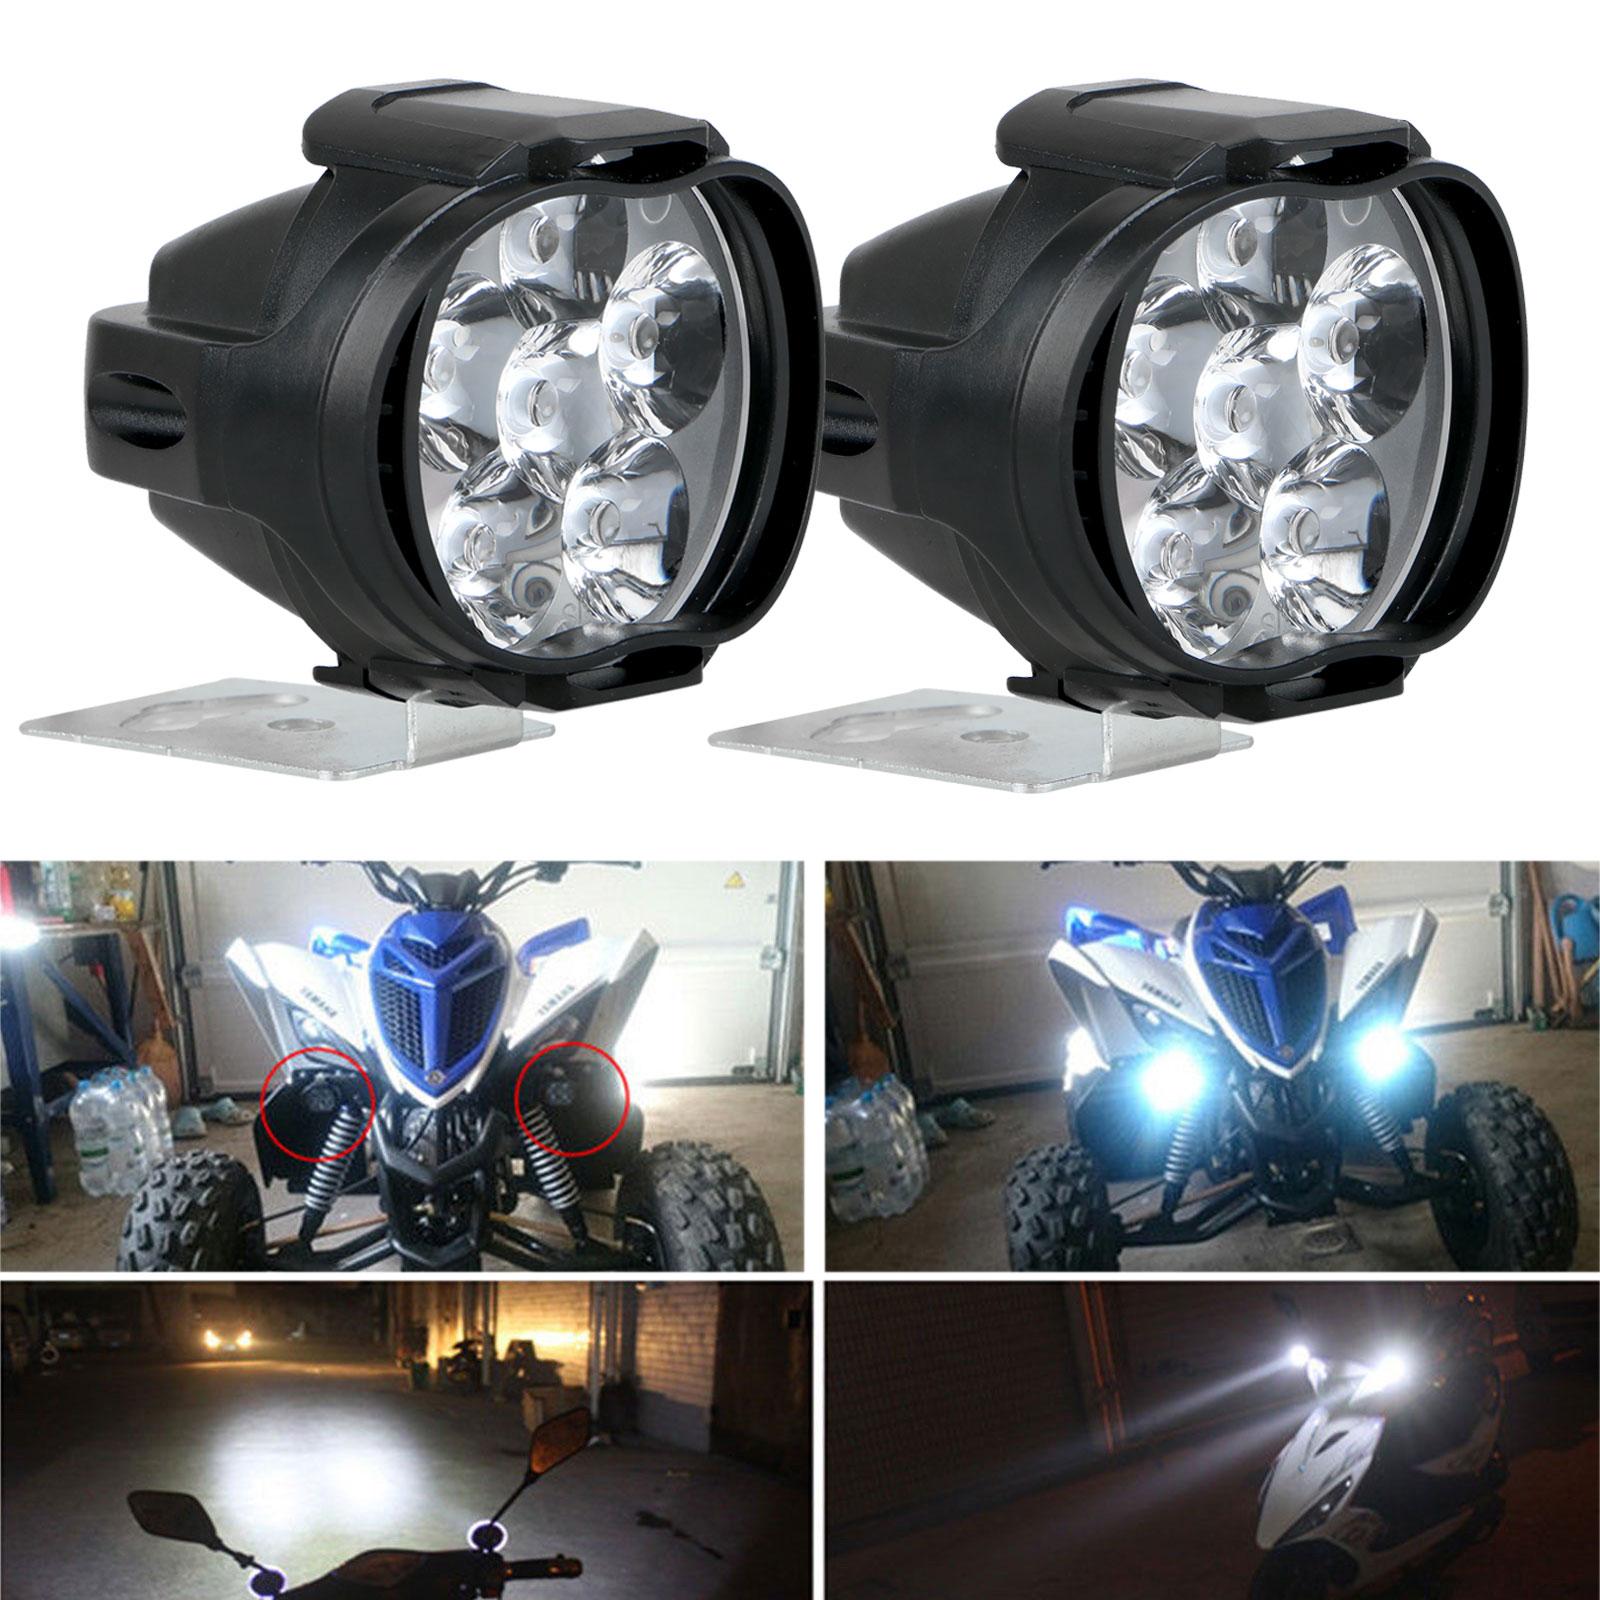 2Pcs-Universal-Car-SUV-Motorcycle-LED-Waterproof-Lights-Fog-Light-Headlight-Lamp